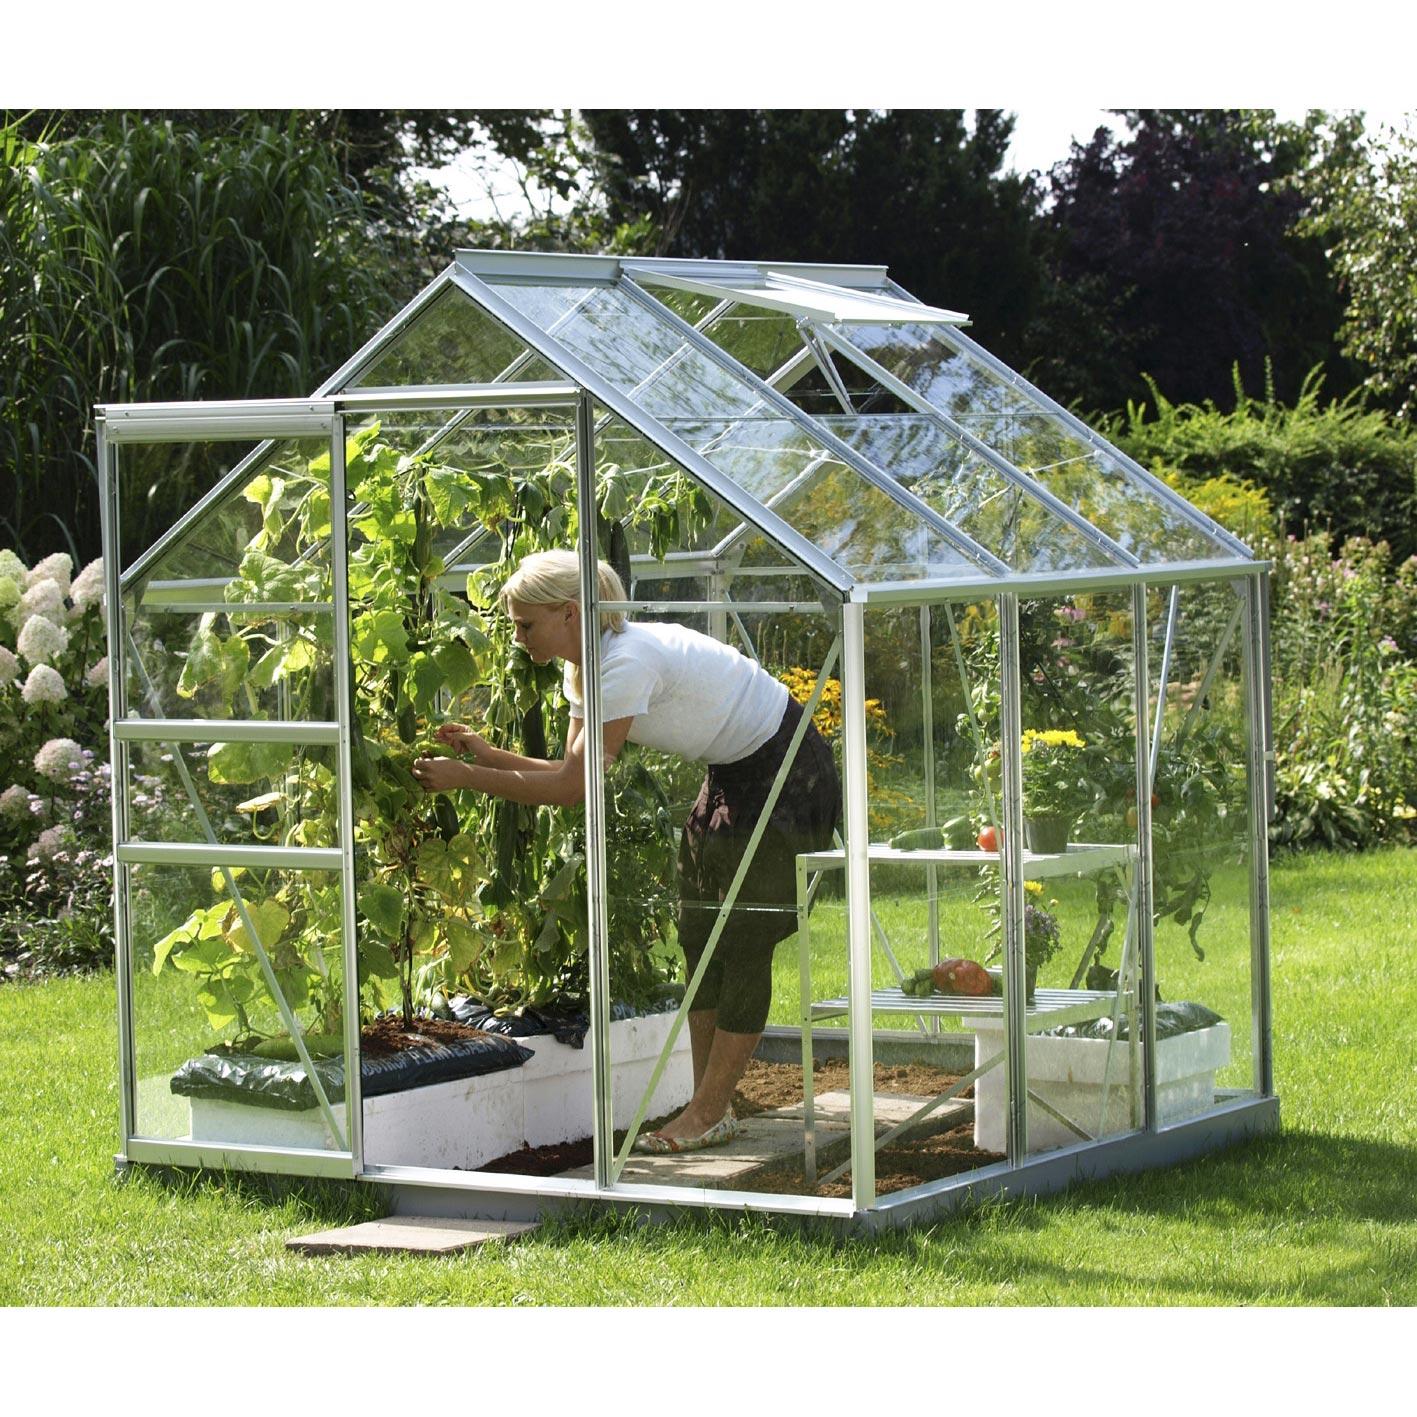 serre venus 3800 en verre horticole m leroy merlin. Black Bedroom Furniture Sets. Home Design Ideas